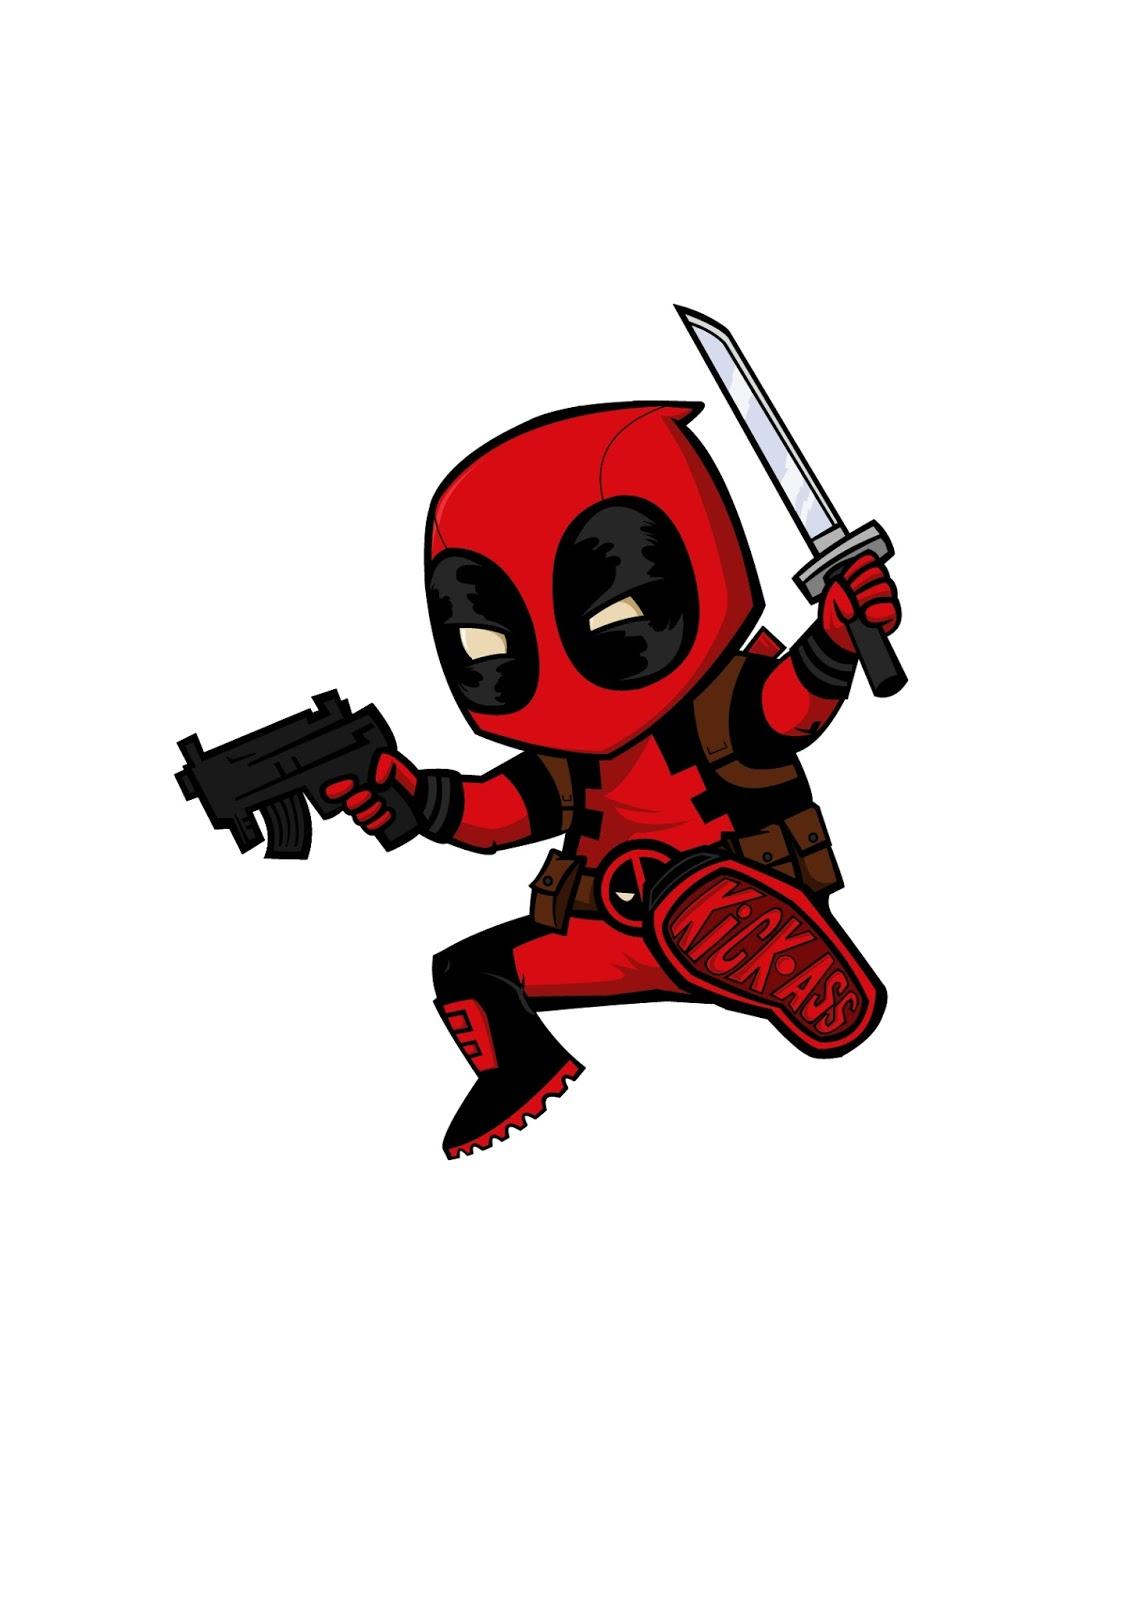 Imagenes De Deadpool Para Dibujar Animado | Kinked